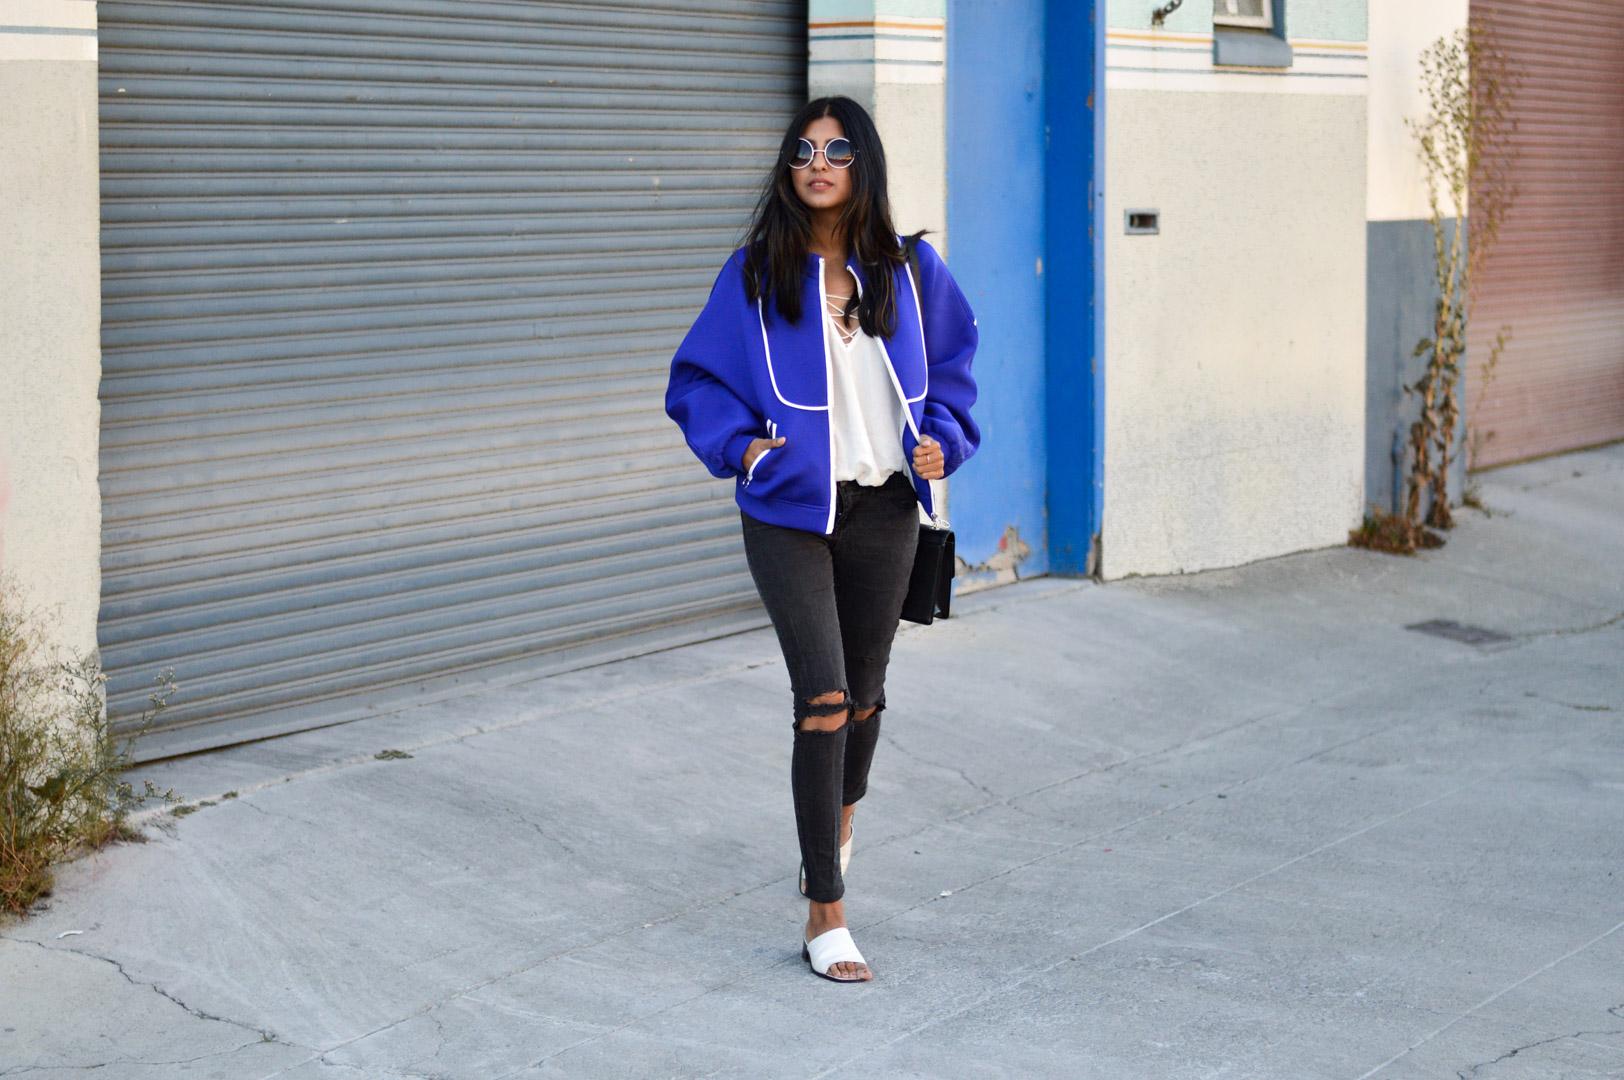 DSC_0901.jpgblue-bomber-jacket-winter-layers-blogger 6